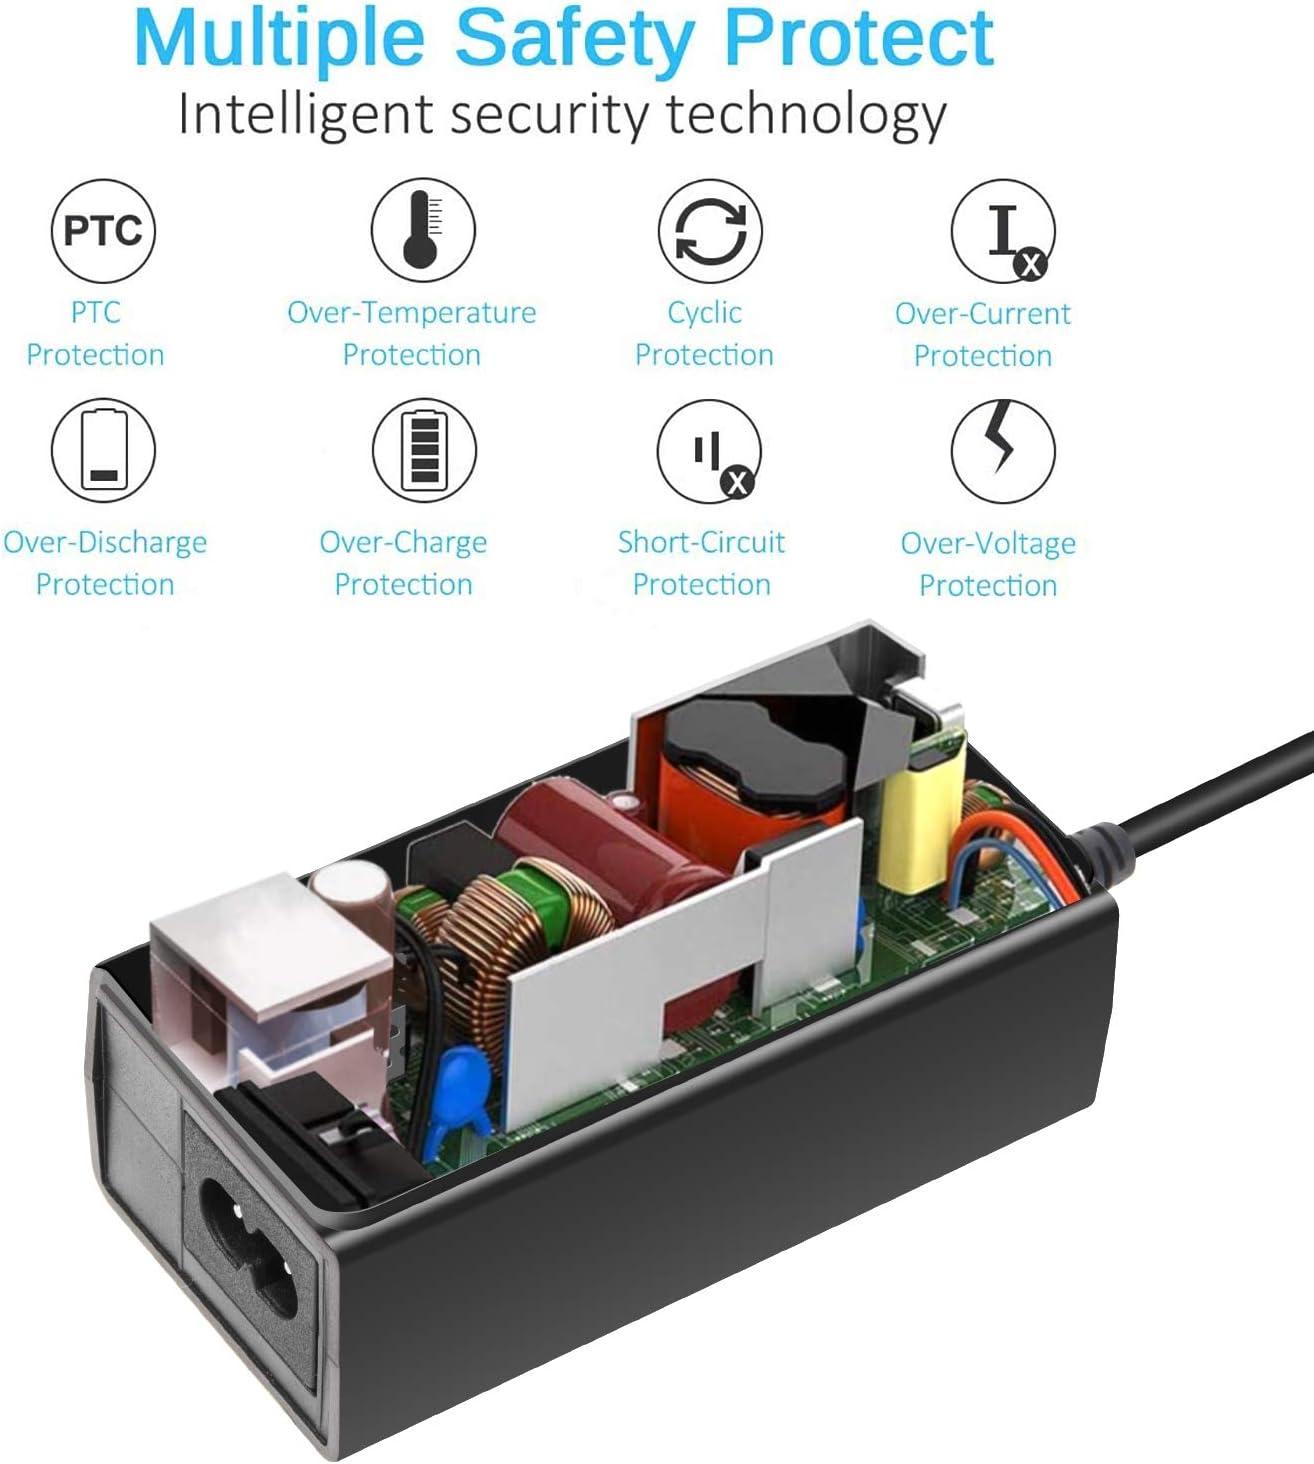 Kimaru DMW-AC10 AC Adapter Kit for Panasonic Lumix DMC-GH3,GH4,GH3K,GH4K,GH3A,GH4H,GH3H,DC-GH5,GH5S,GH5M,G9,G9L Camera AC Adaptor and DMW-DCC12 DC Coupler Charger Replace Panasonic BLF-19 Battery